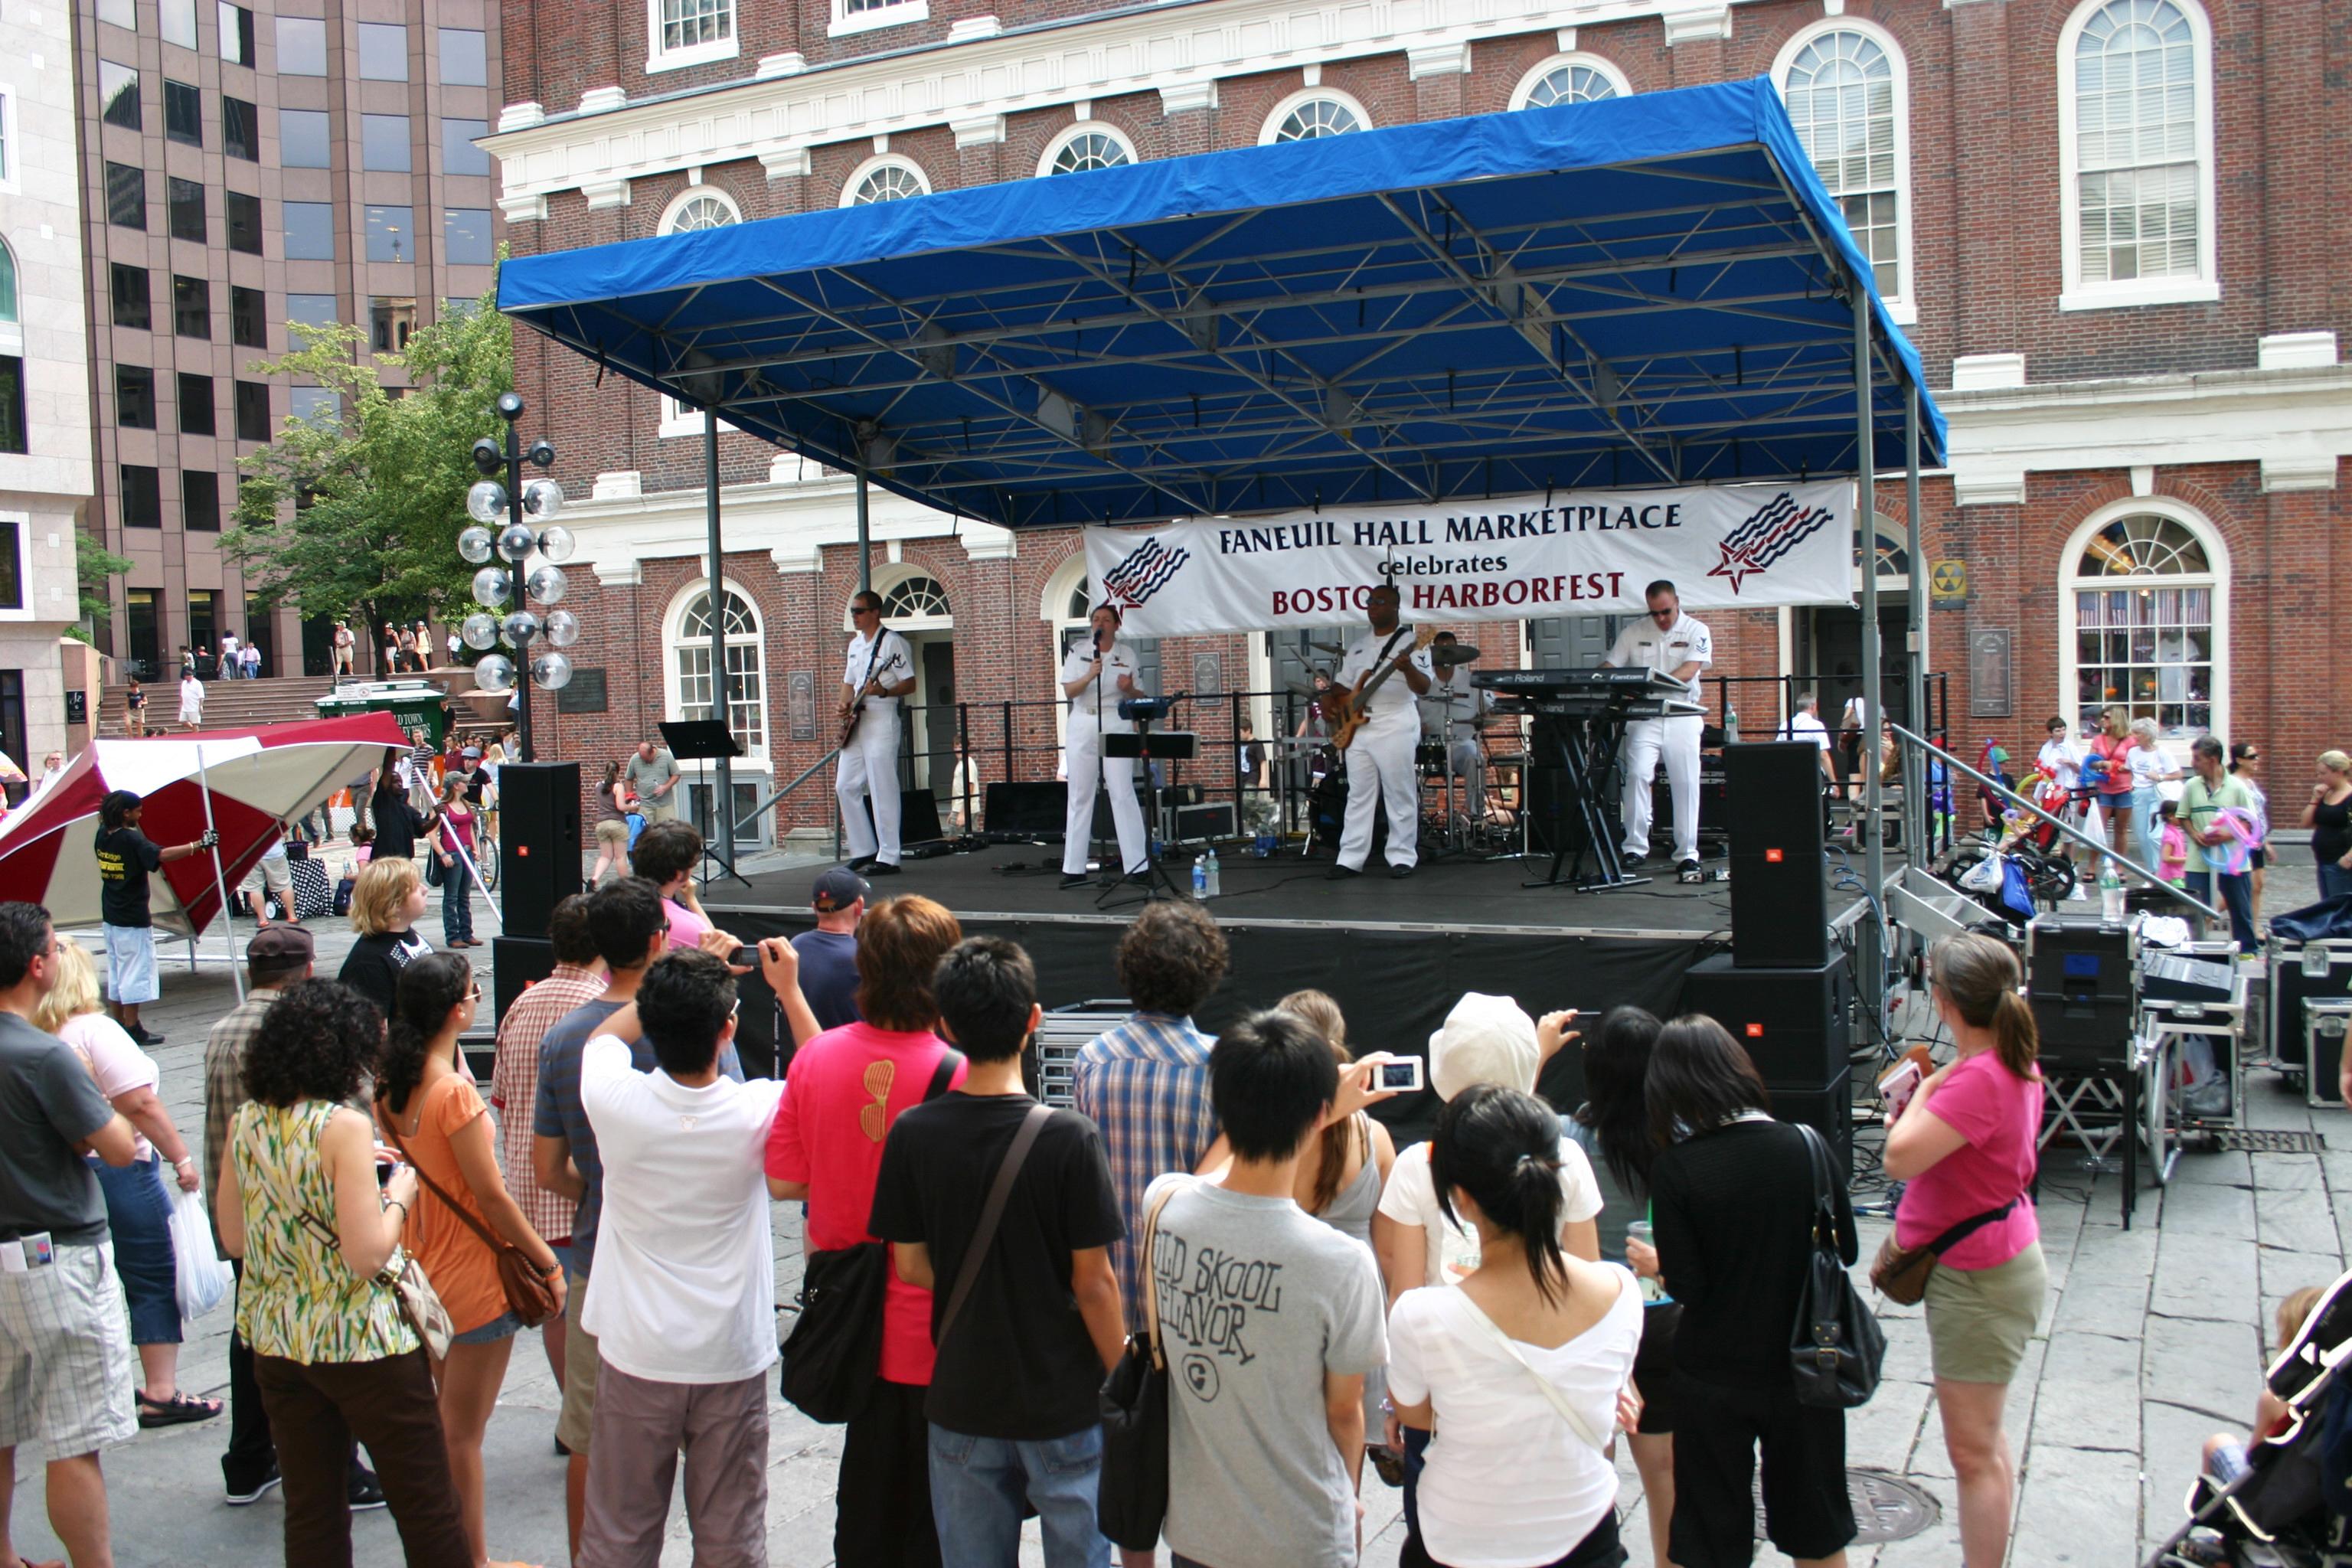 Rhode Island Sound The Navy Rock Band